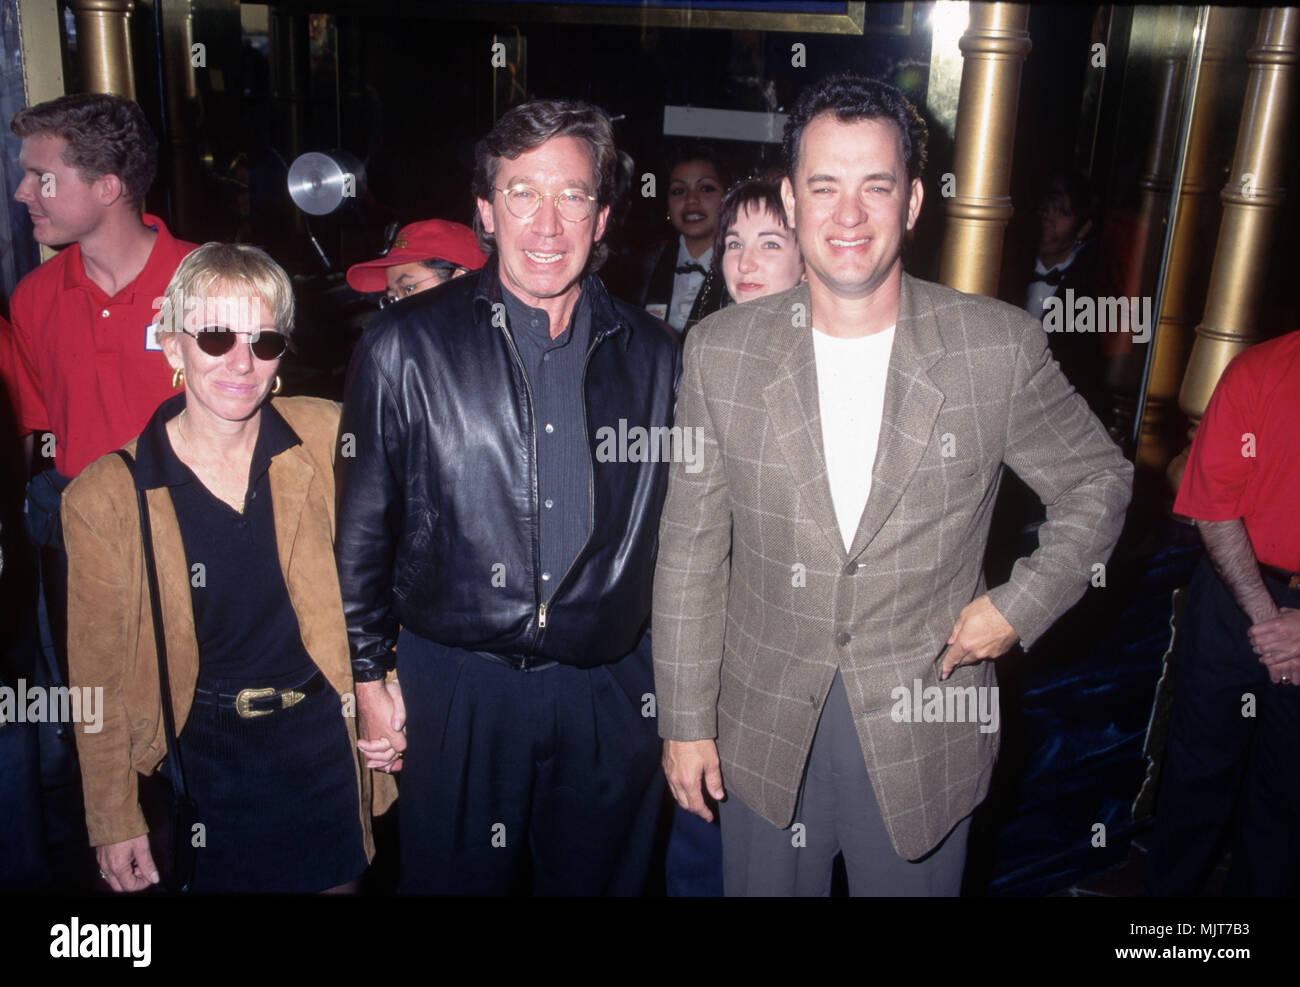 ¿Cuánto mide Tom Hanks? - Altura - Real height Tim-allen-y-esposa-con-tom-hanks-tsuni-usa-tim-allen-y-esposa-con-tom-hanks-tim-allen-y-esposa-con-tom-hanks-investigacion-tsuni-gamma-usa-com-mjt7b3